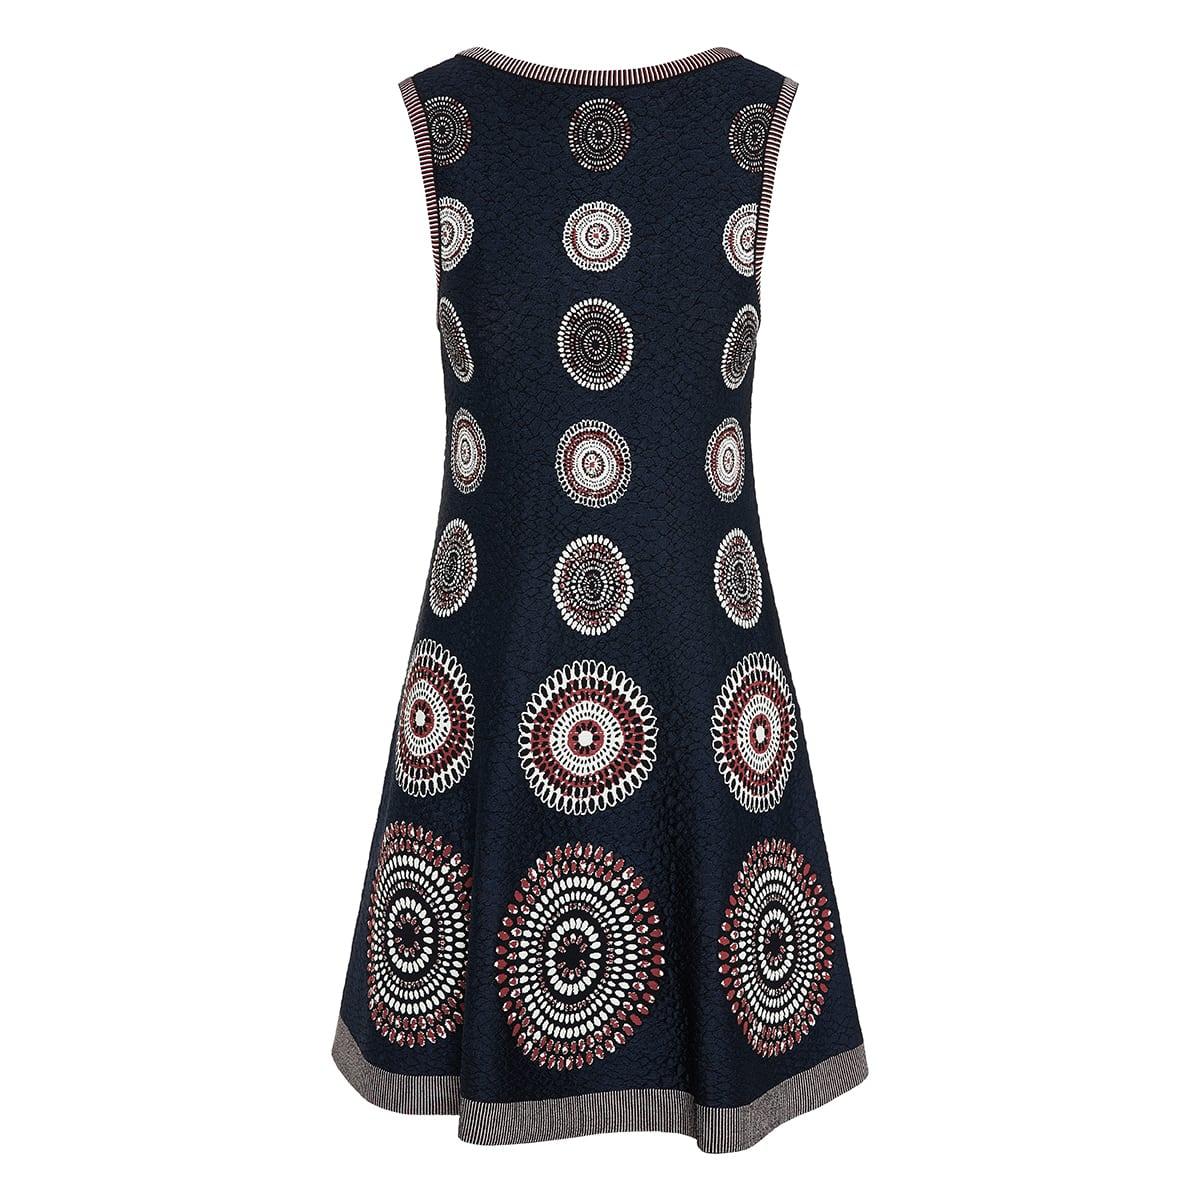 Molukai patterned flared dress